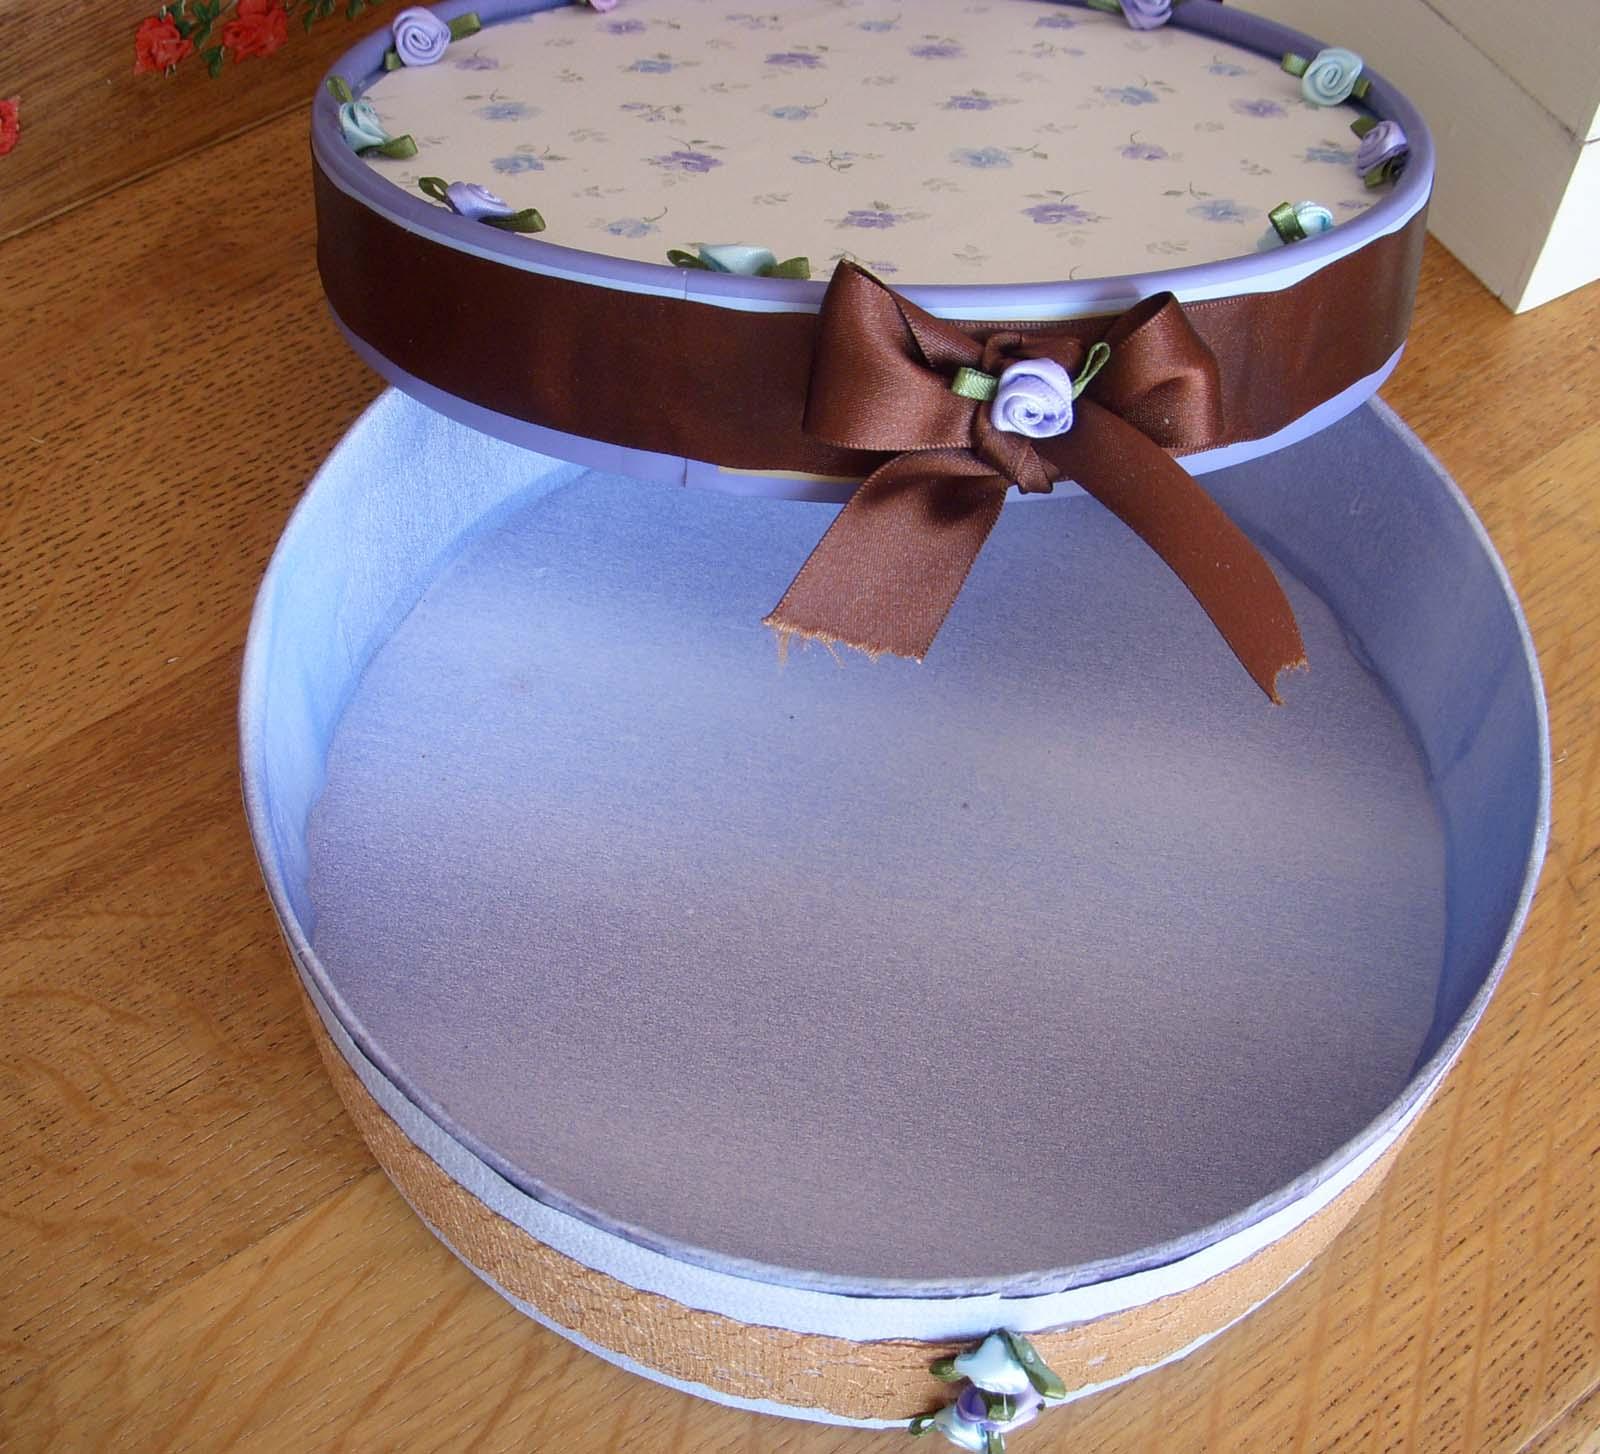 http://4.bp.blogspot.com/_iHhG4m9ecPQ/S__o-847zXI/AAAAAAAAAG0/0CpKiycrCfw/s1600/chocolate+box+2.JPG